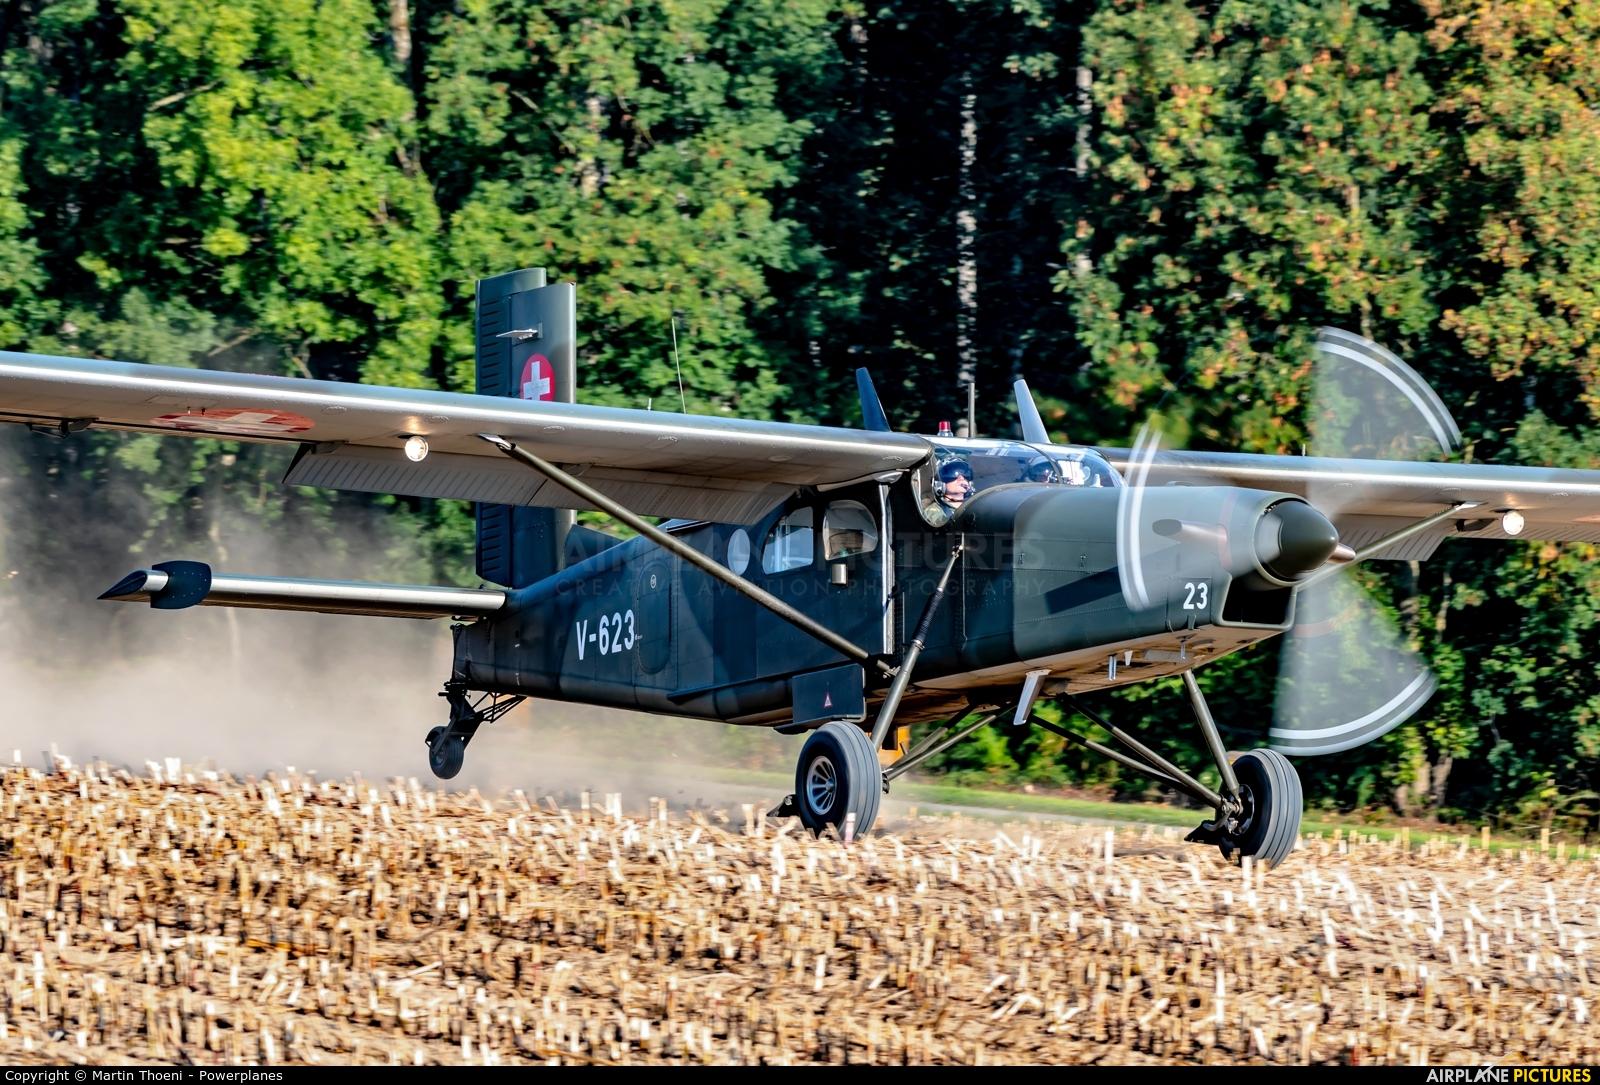 Switzerland - Air Force V-623 aircraft at Off Airport - Ebersecken